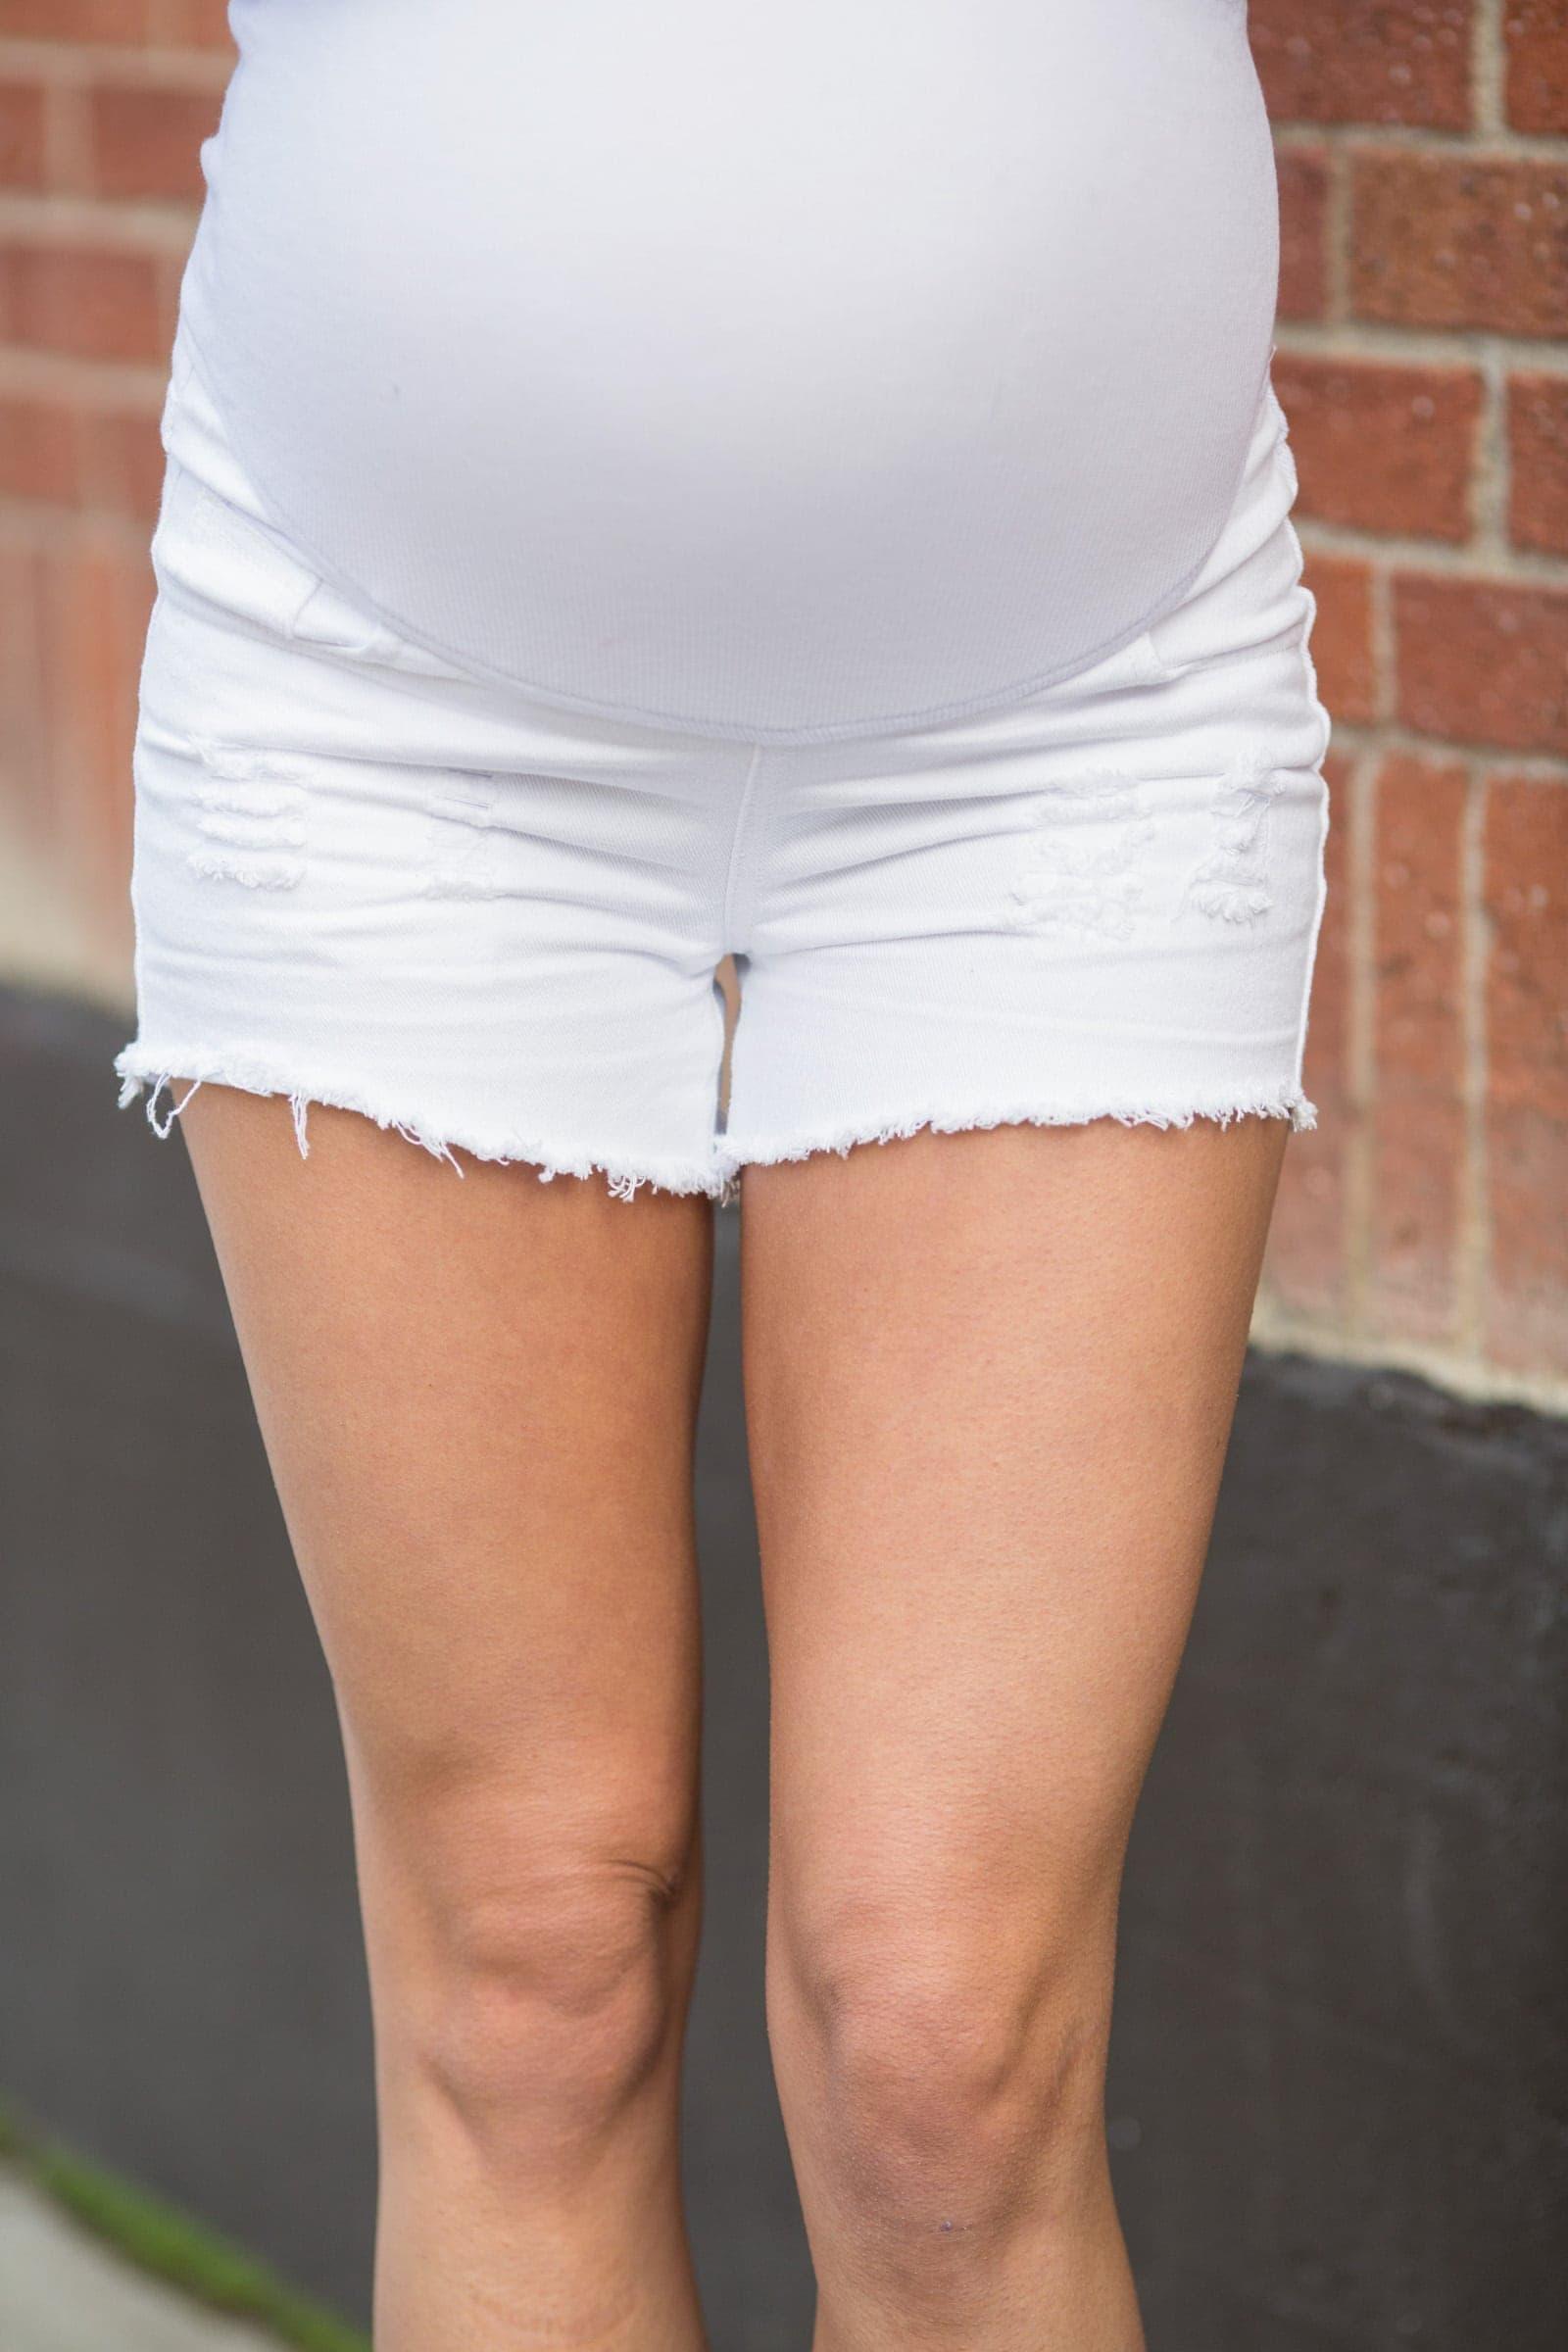 c29f63e59e7ed Cute Maternity Shorts - Not Your Grandma's Shorts - White Cutoffs